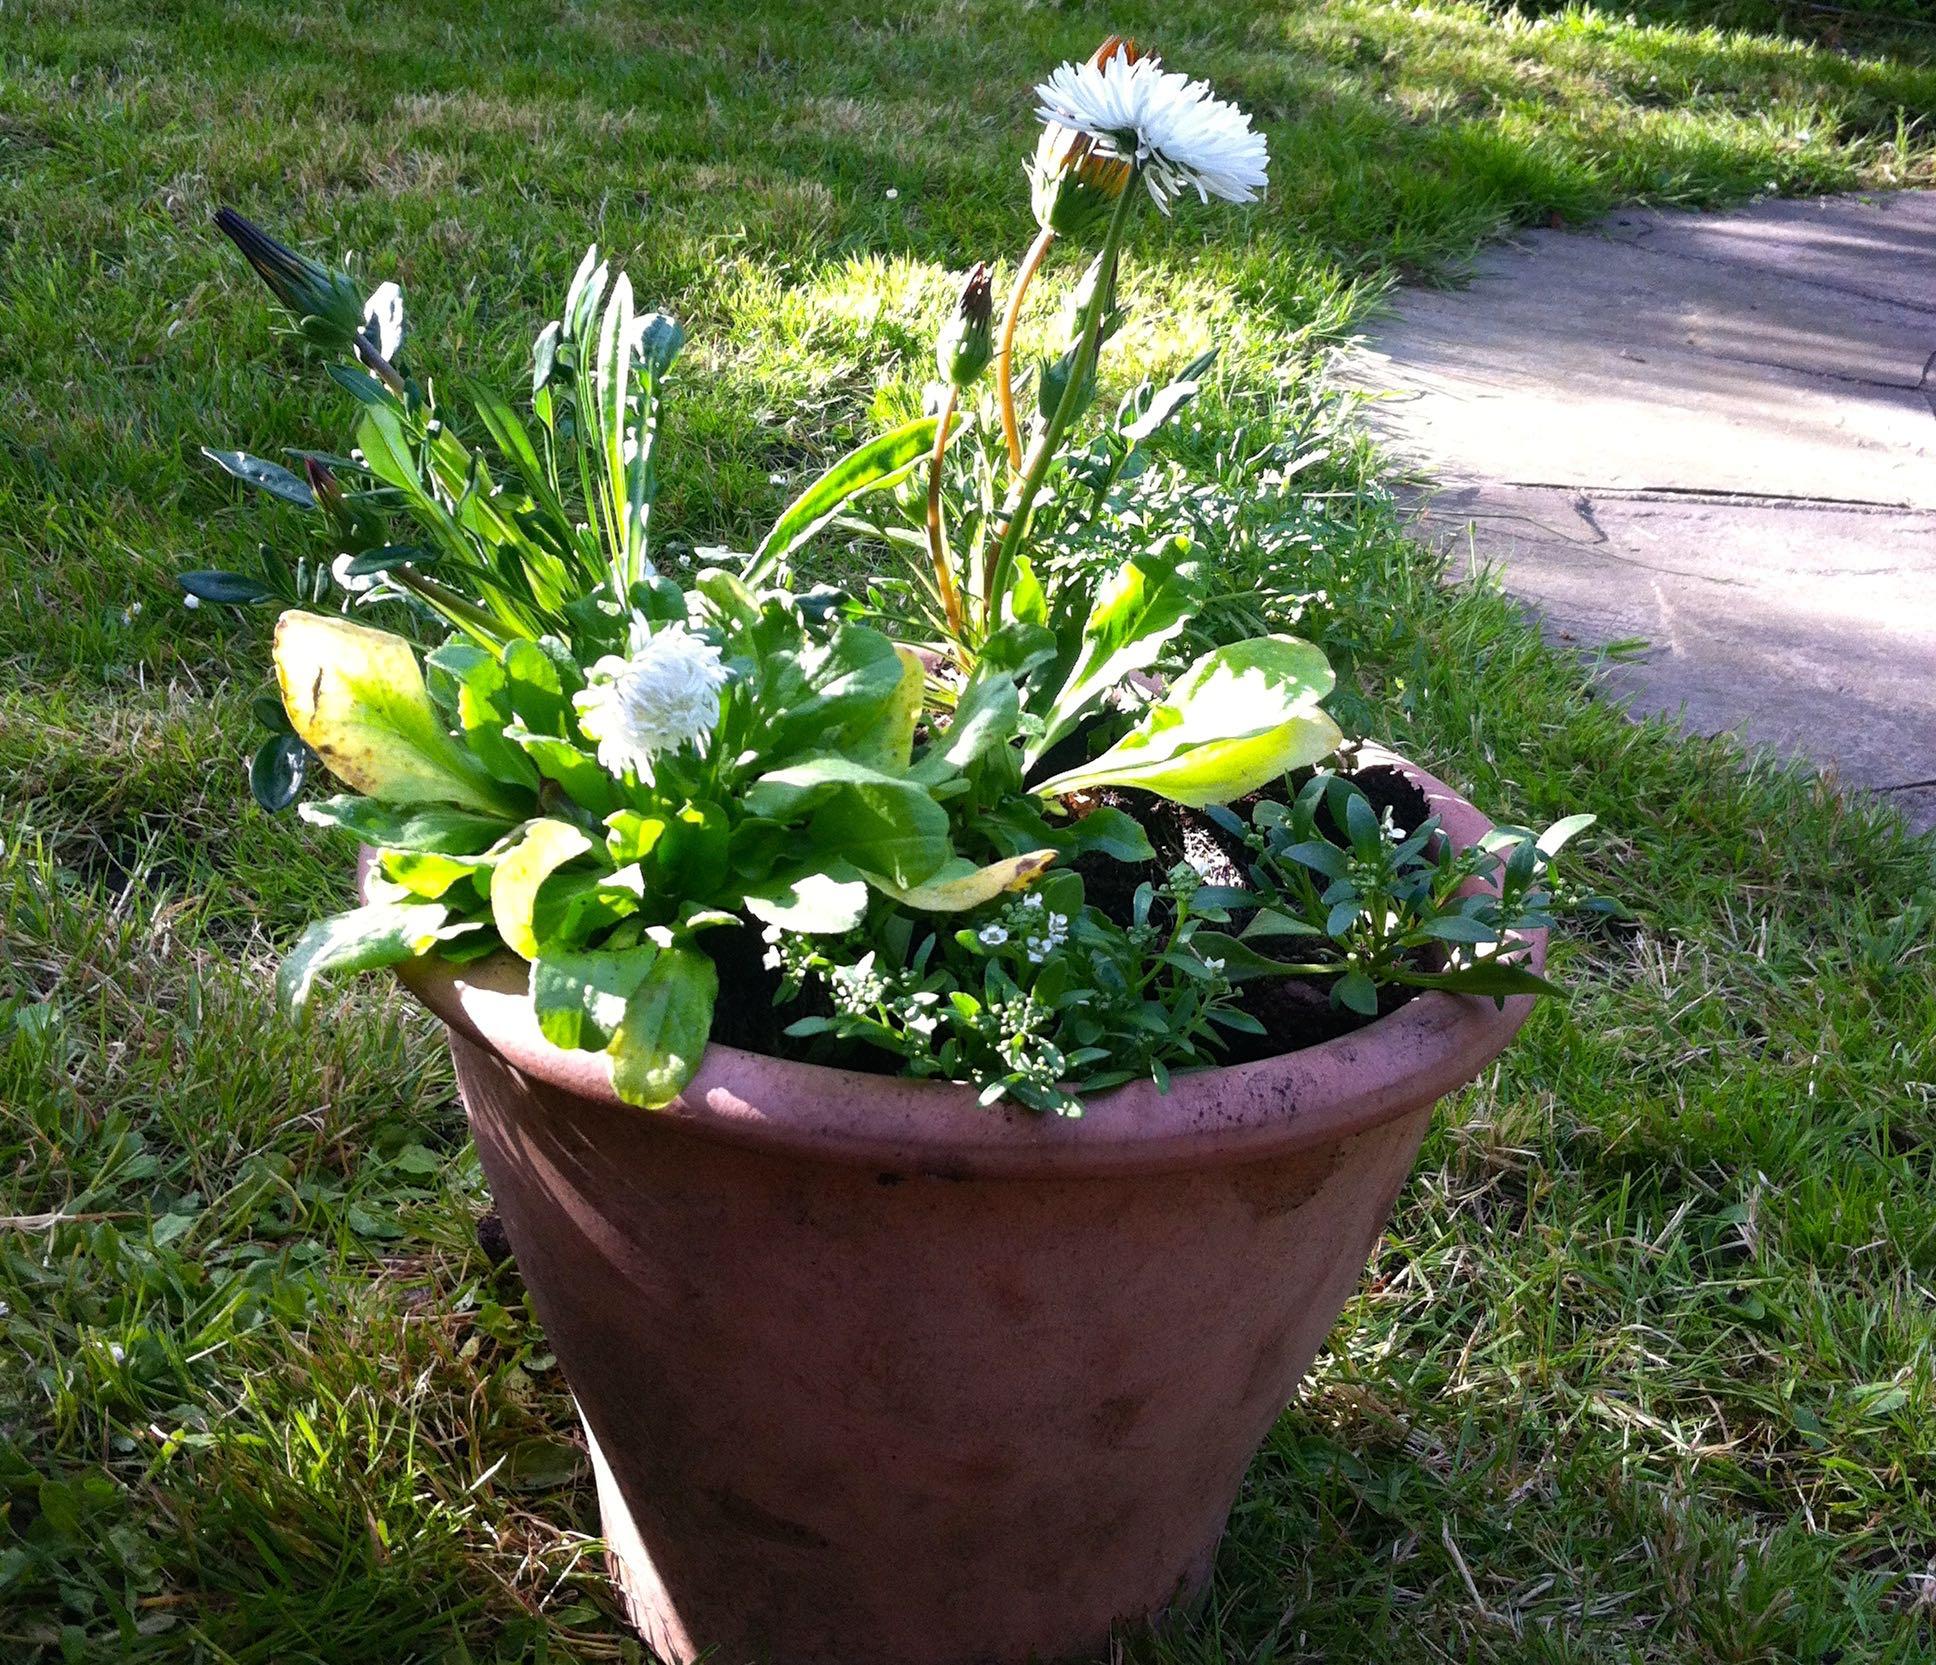 Bellis white flowers standing tall